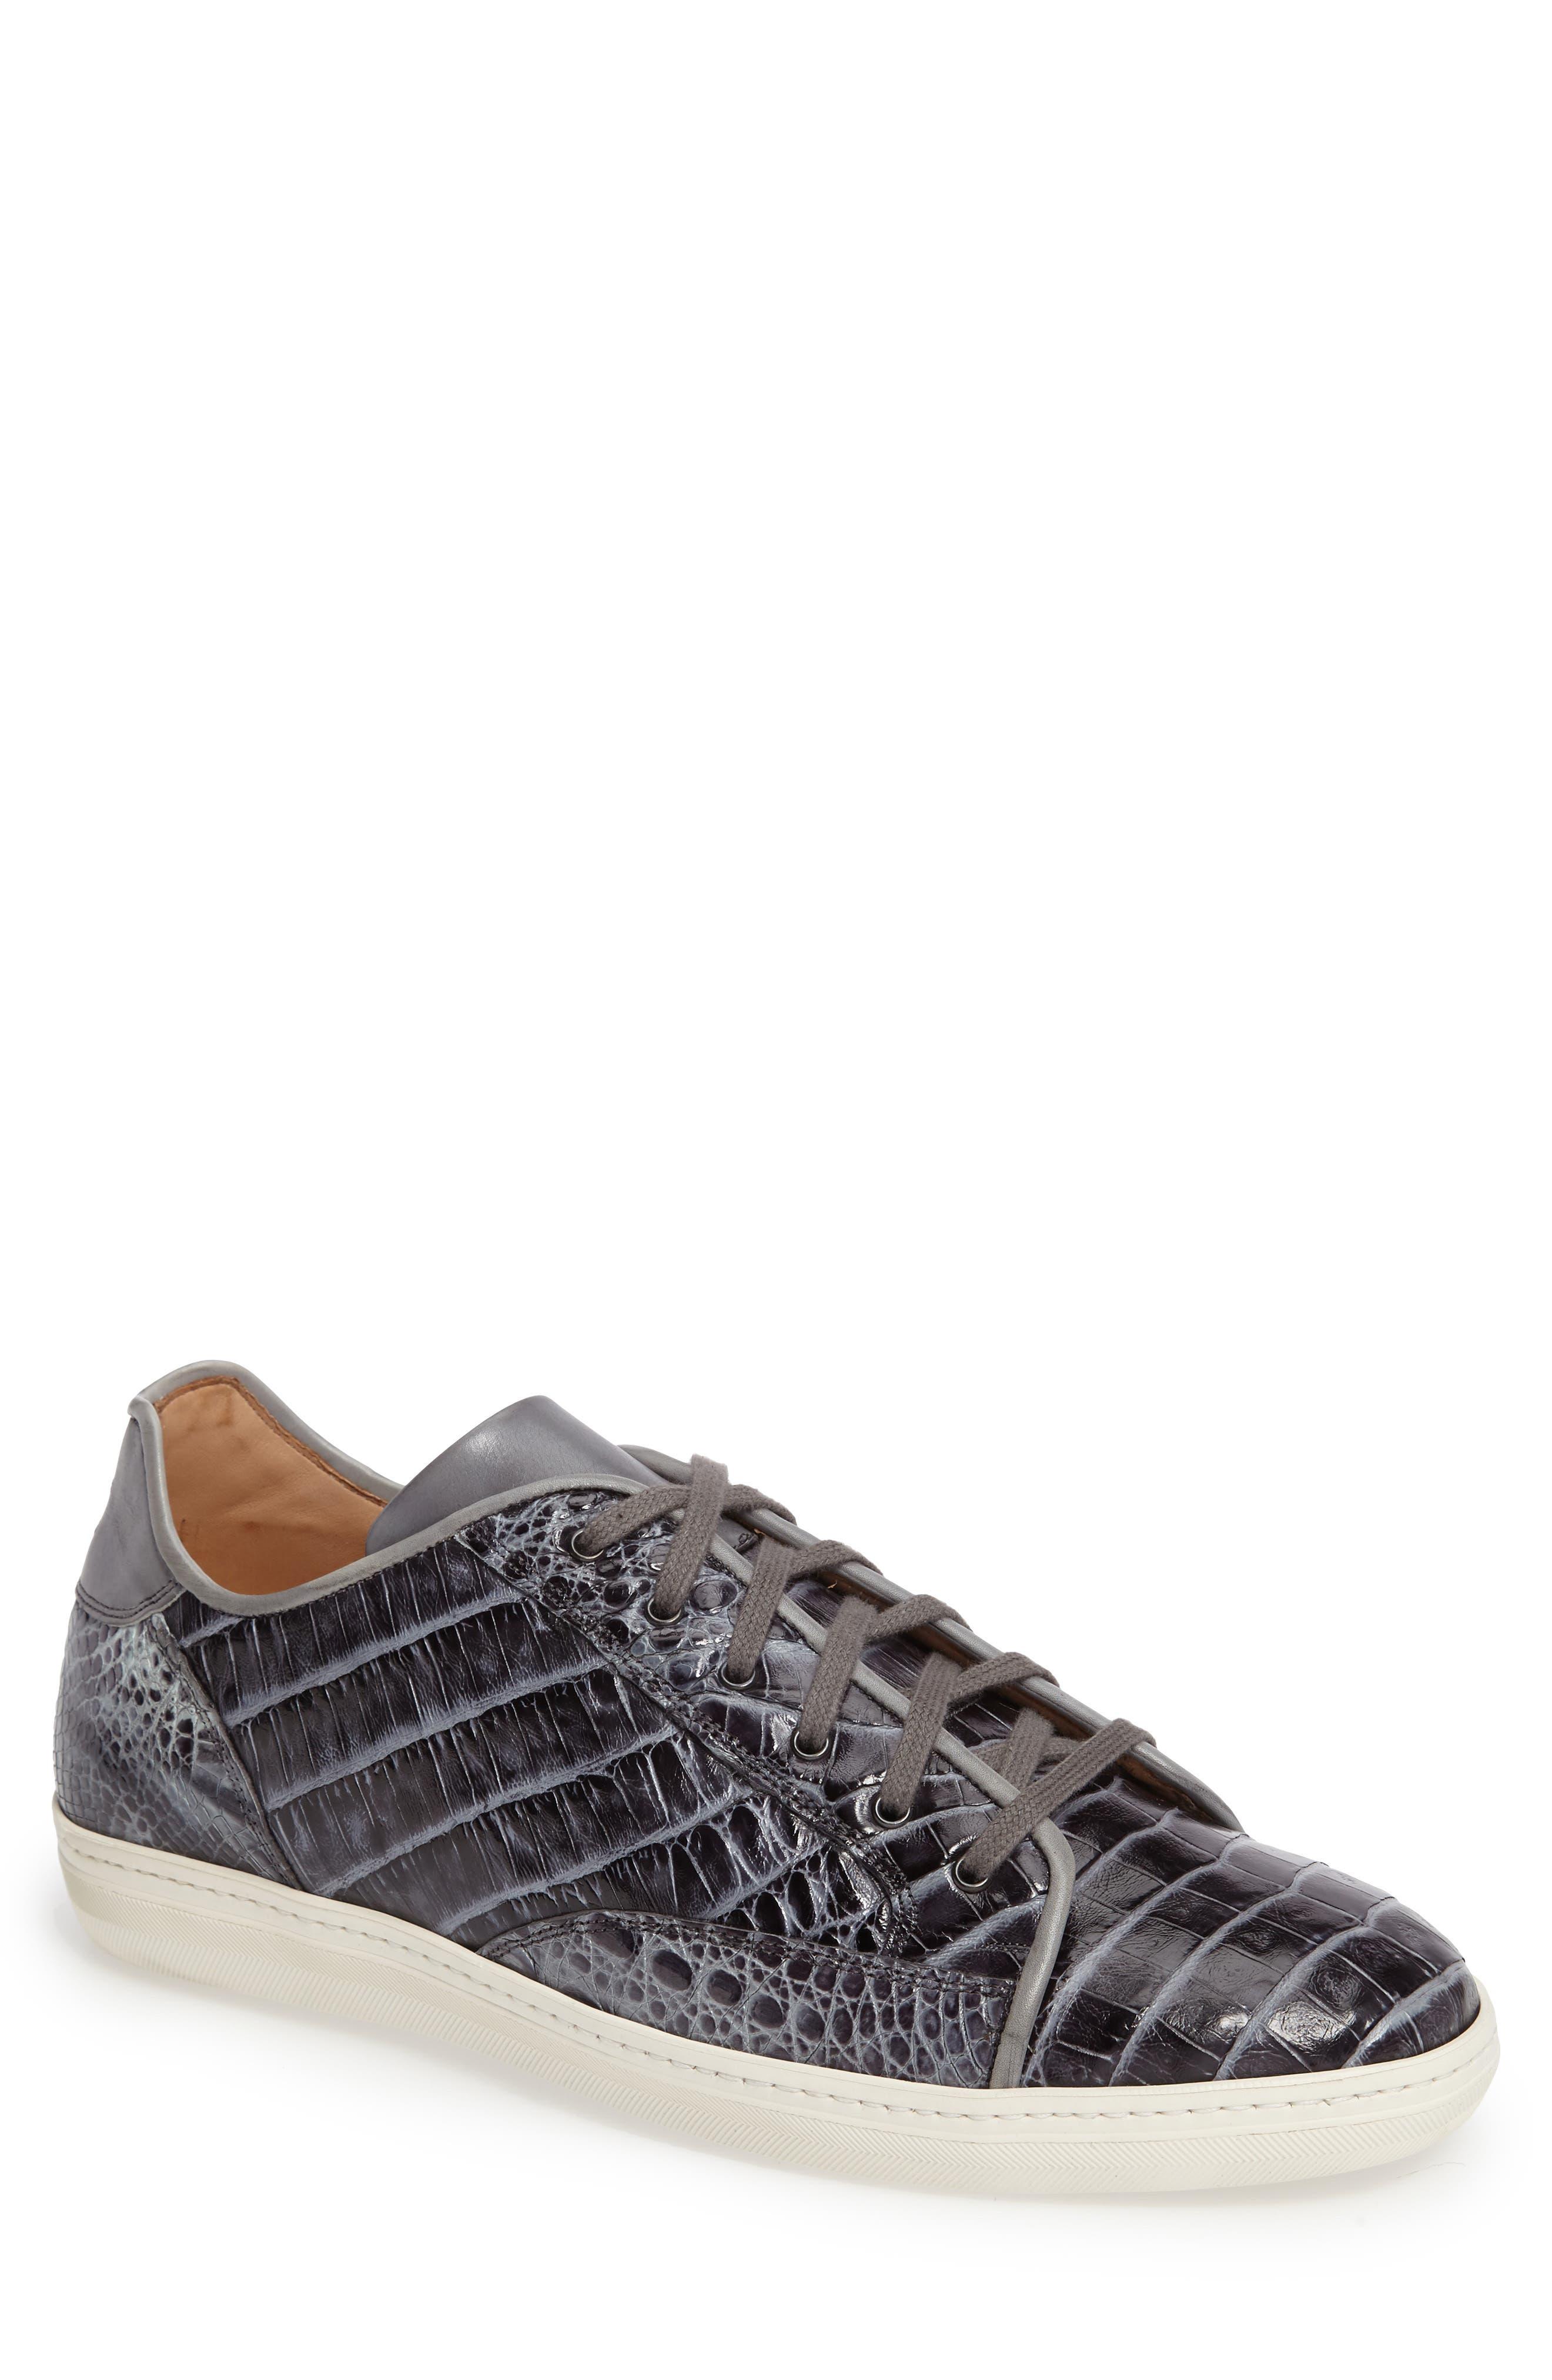 Hickman Genuine Crocodile Sneaker,                         Main,                         color, 020